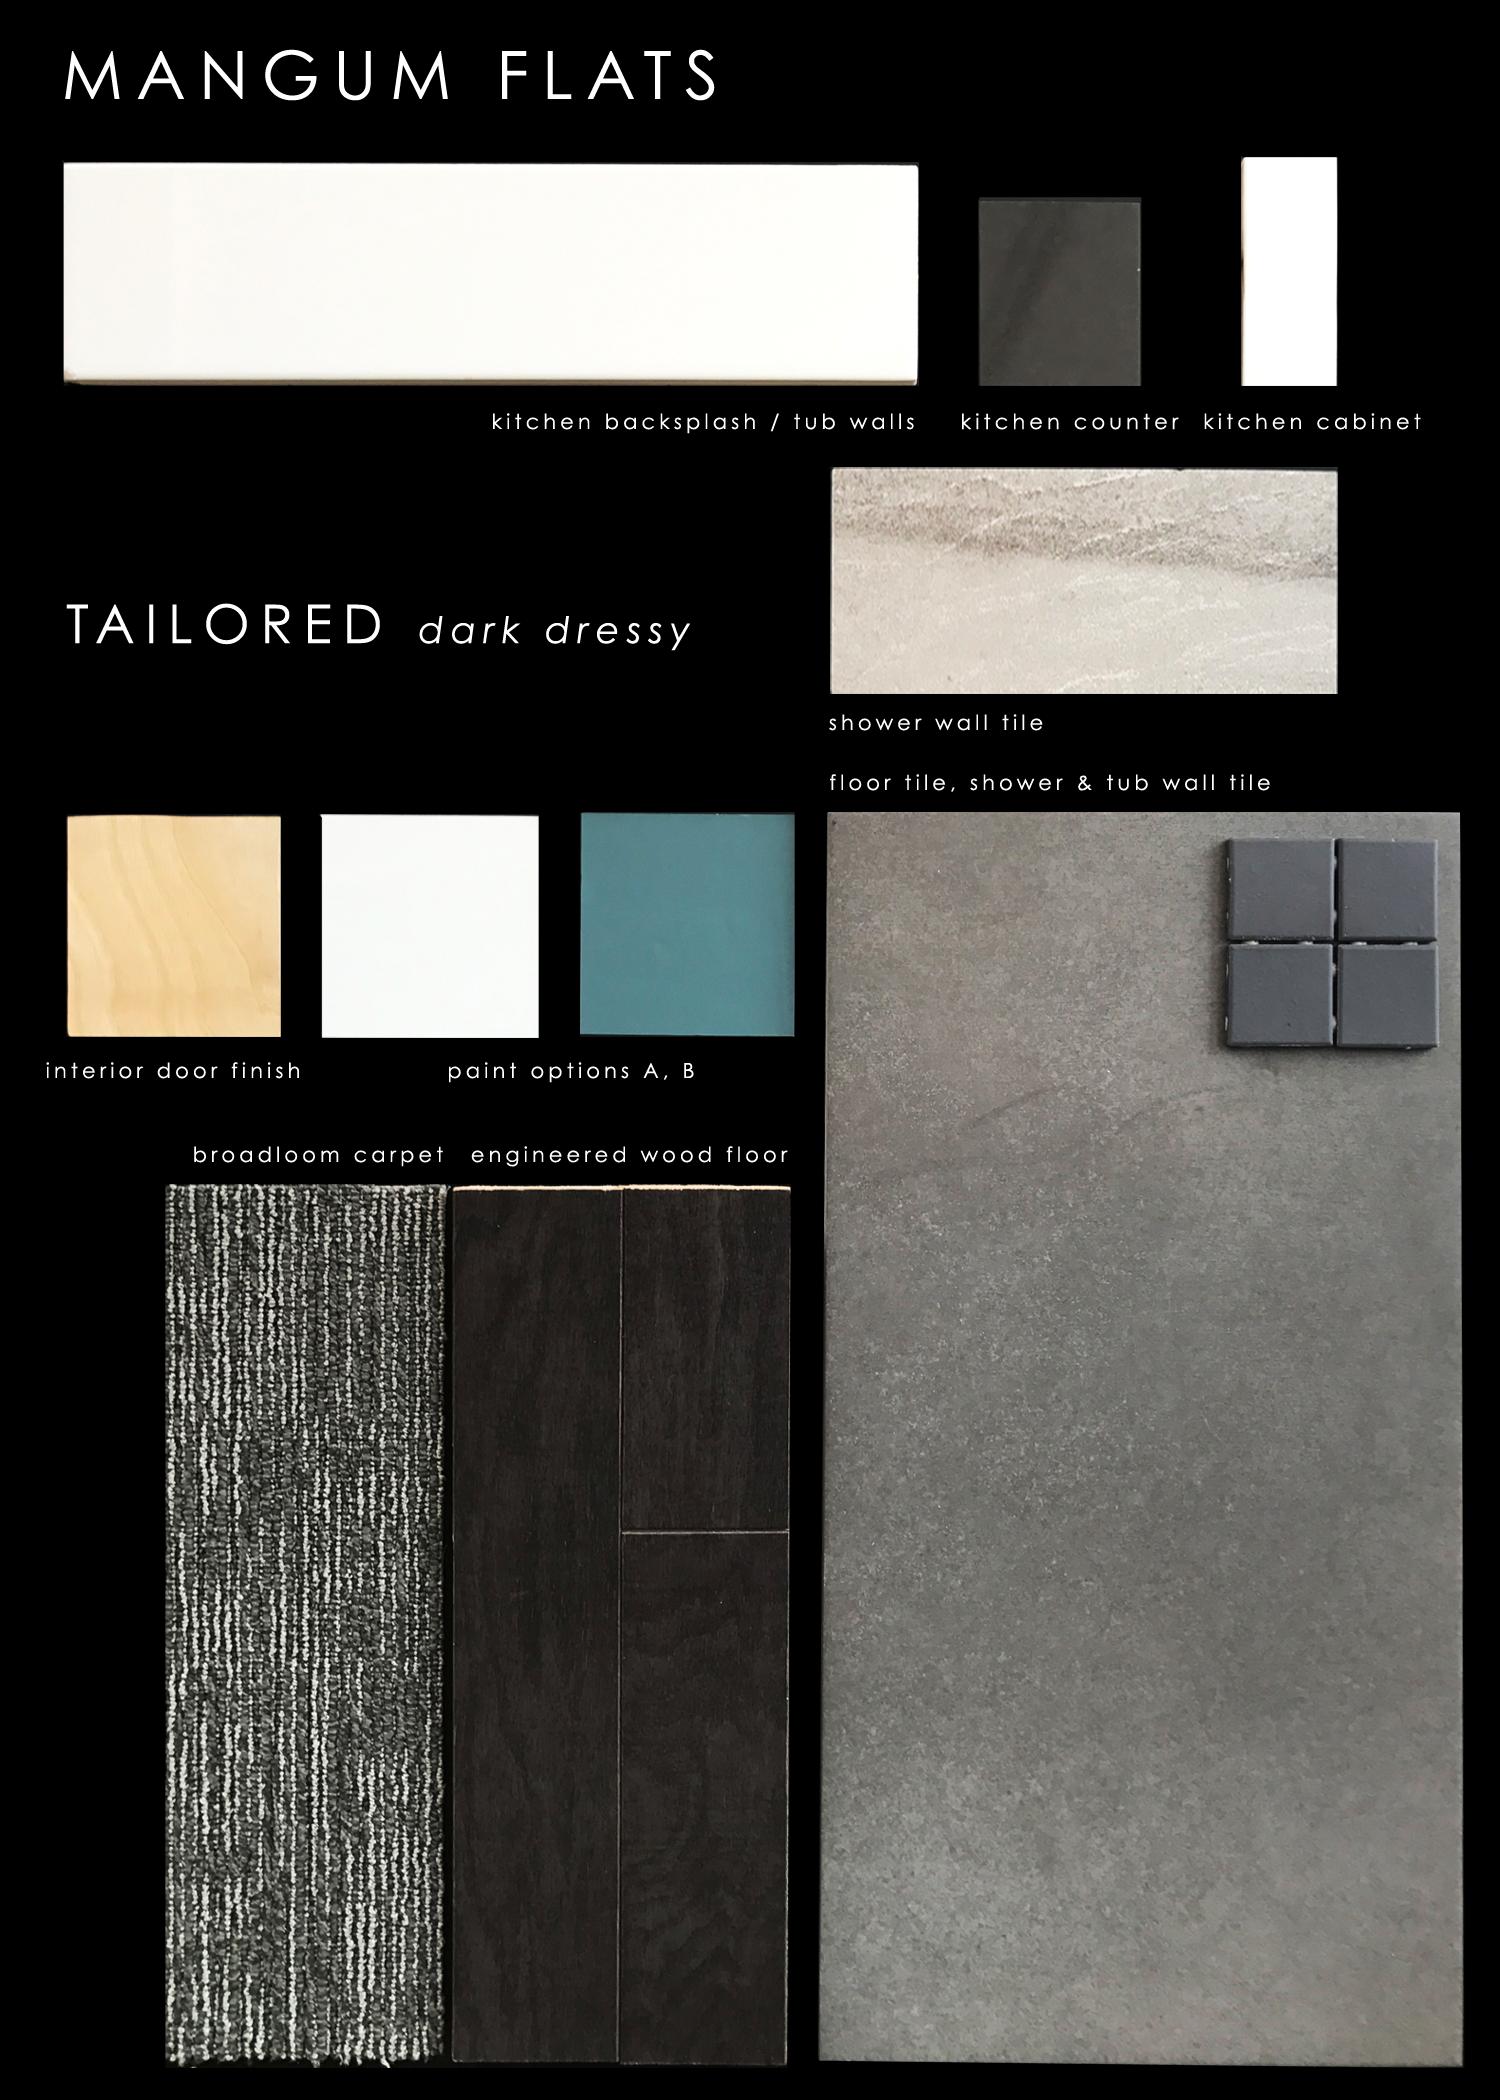 Finish Package:Tailored dark dressy